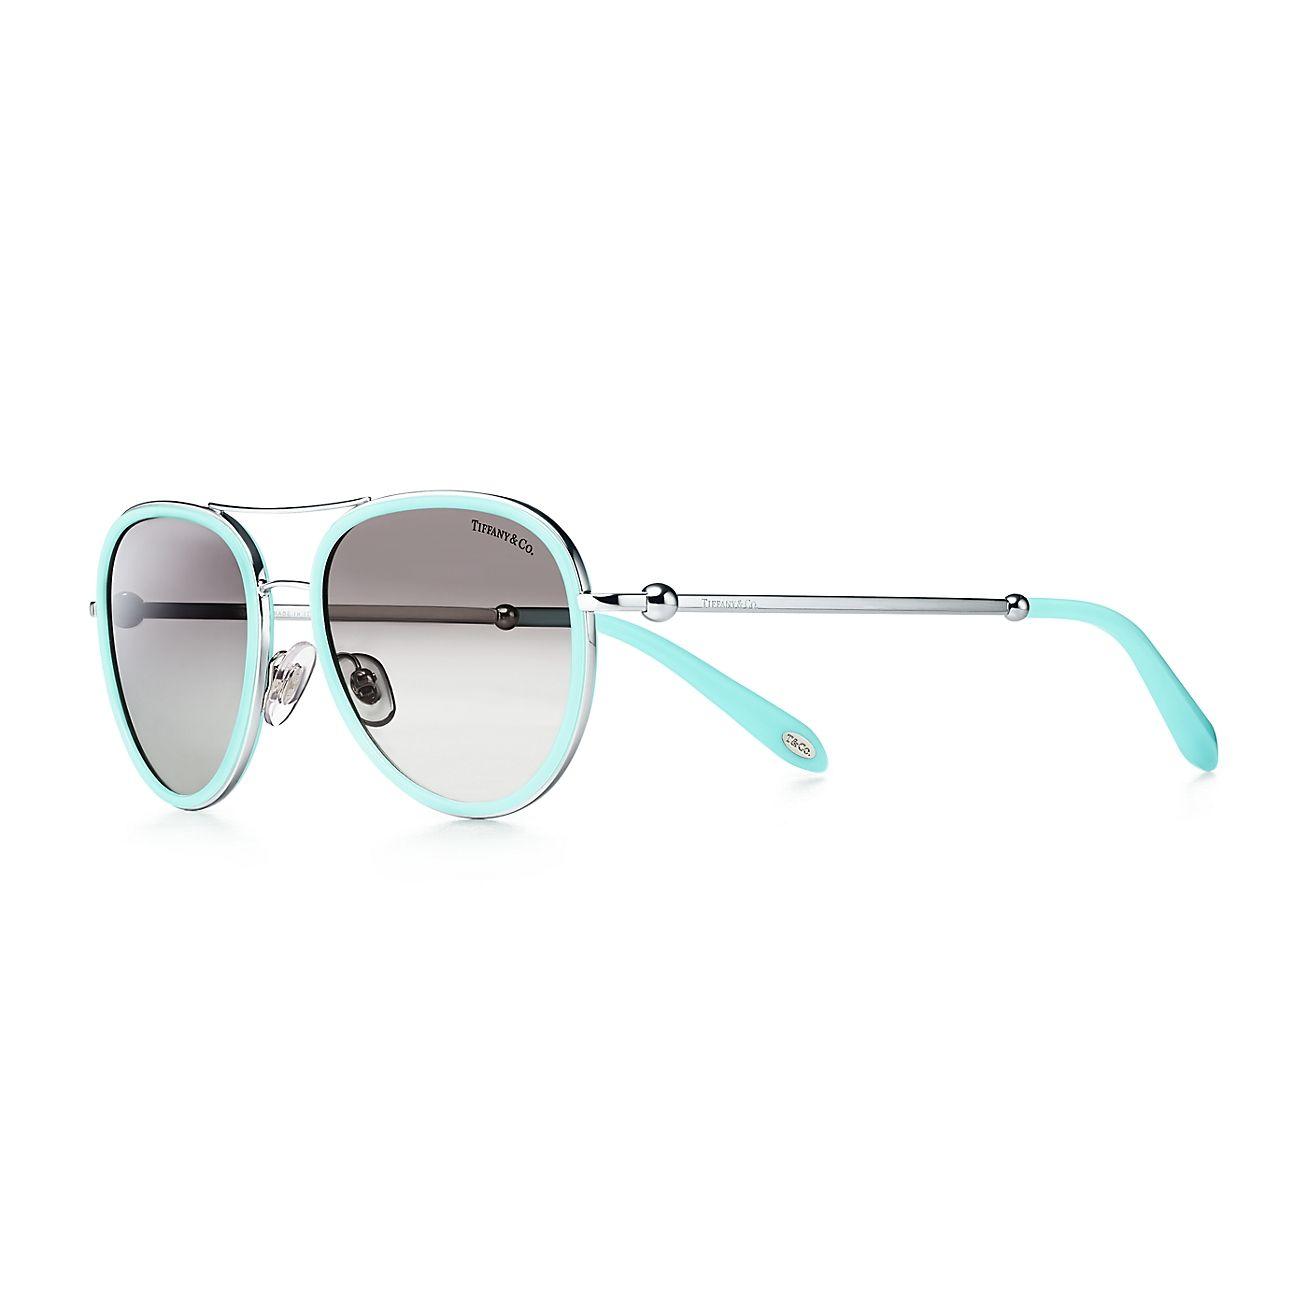 27445a545034 Tiffany HardWear Aviator Sunglasses